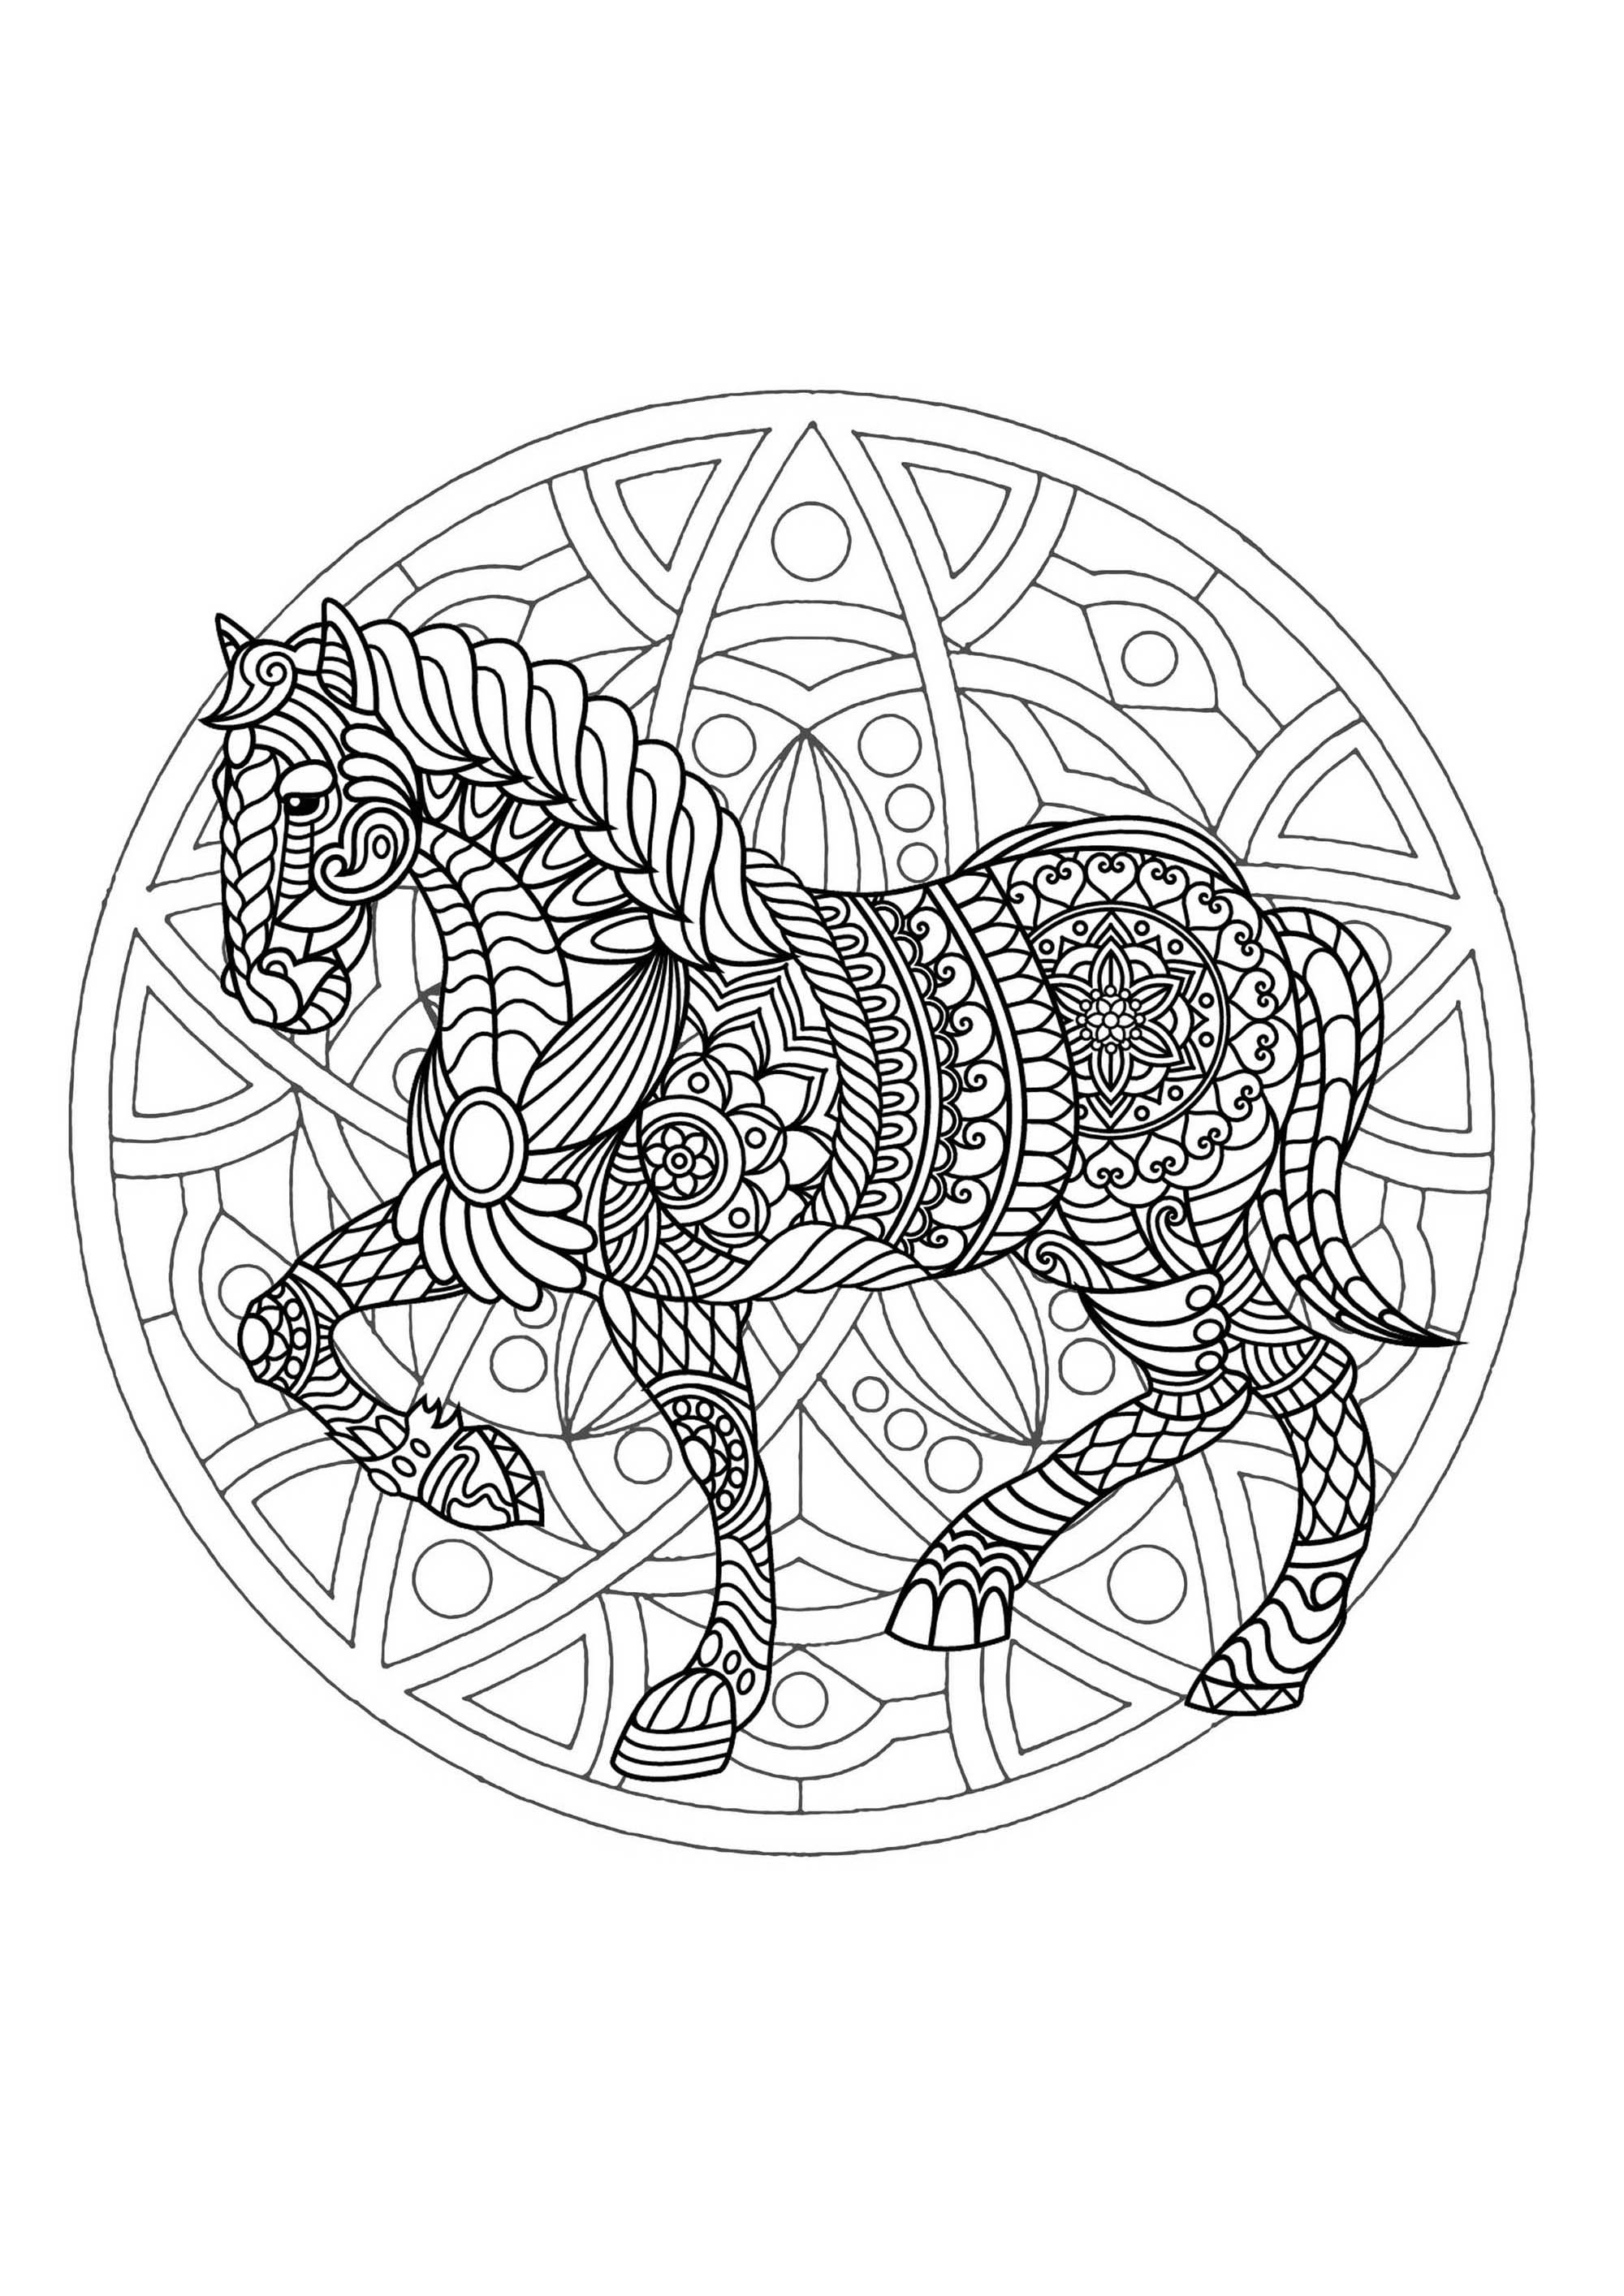 Mandala gratuit cheval coloriage mandalas coloriages - Coloriage mandala enfants ...